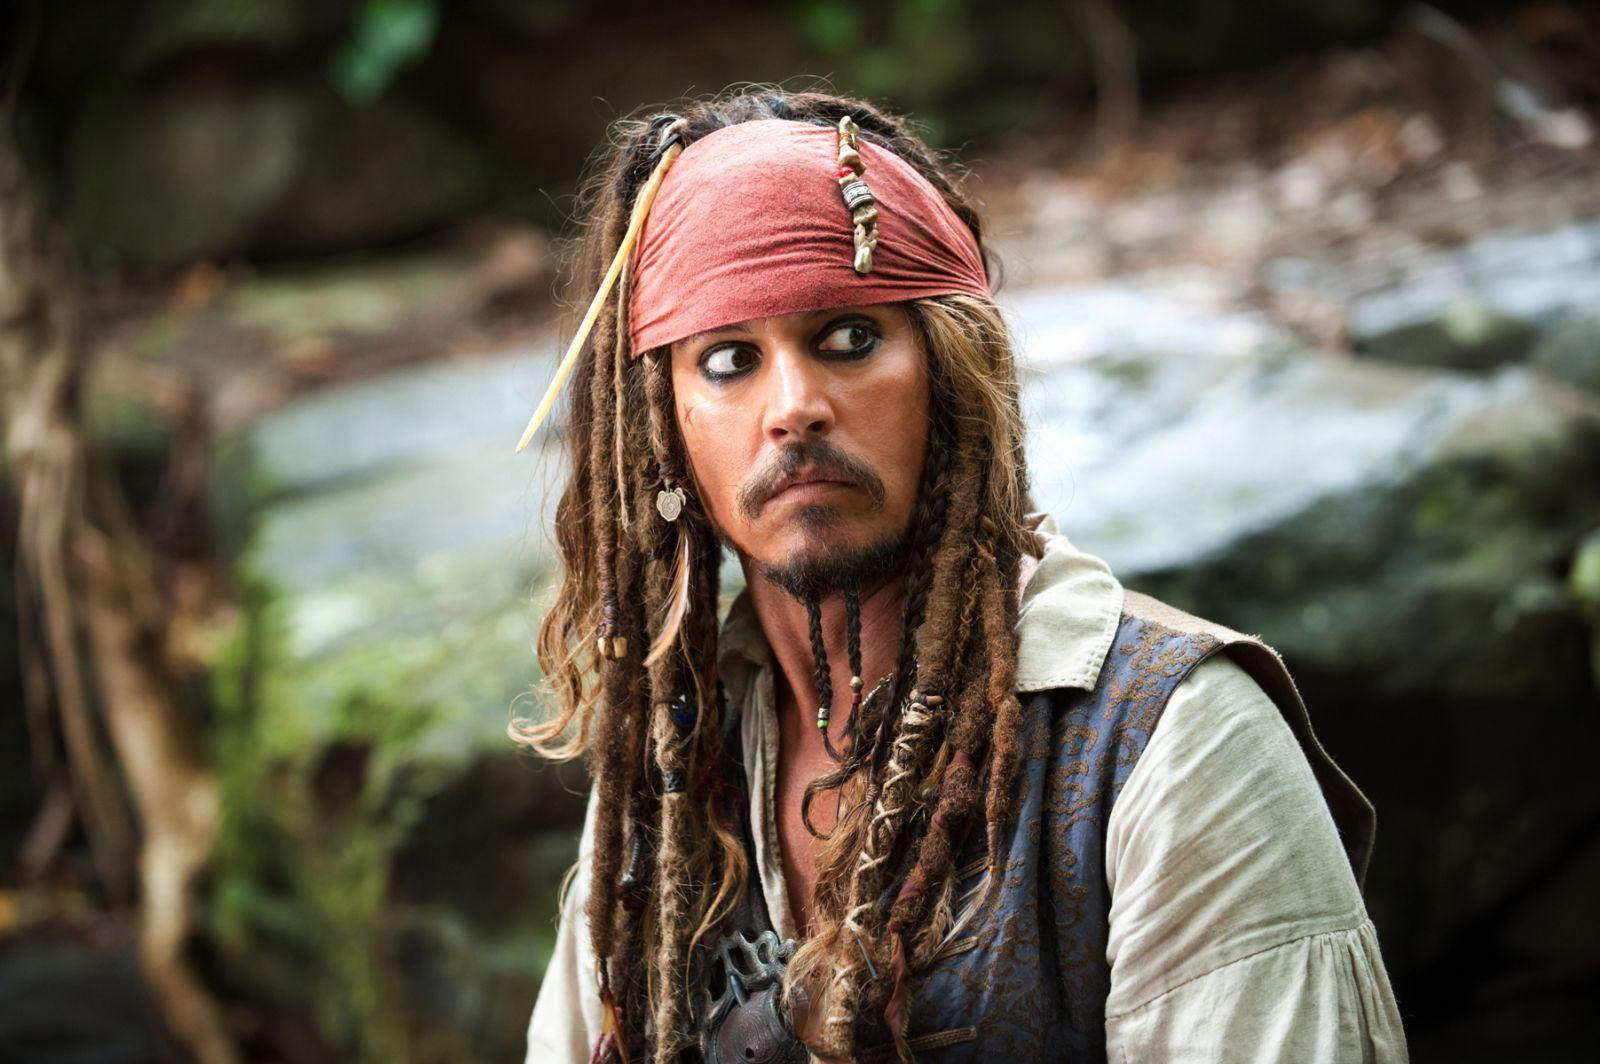 Pirates: Digitista MediaWave: Mermaids Save The Pirates -- Pirates